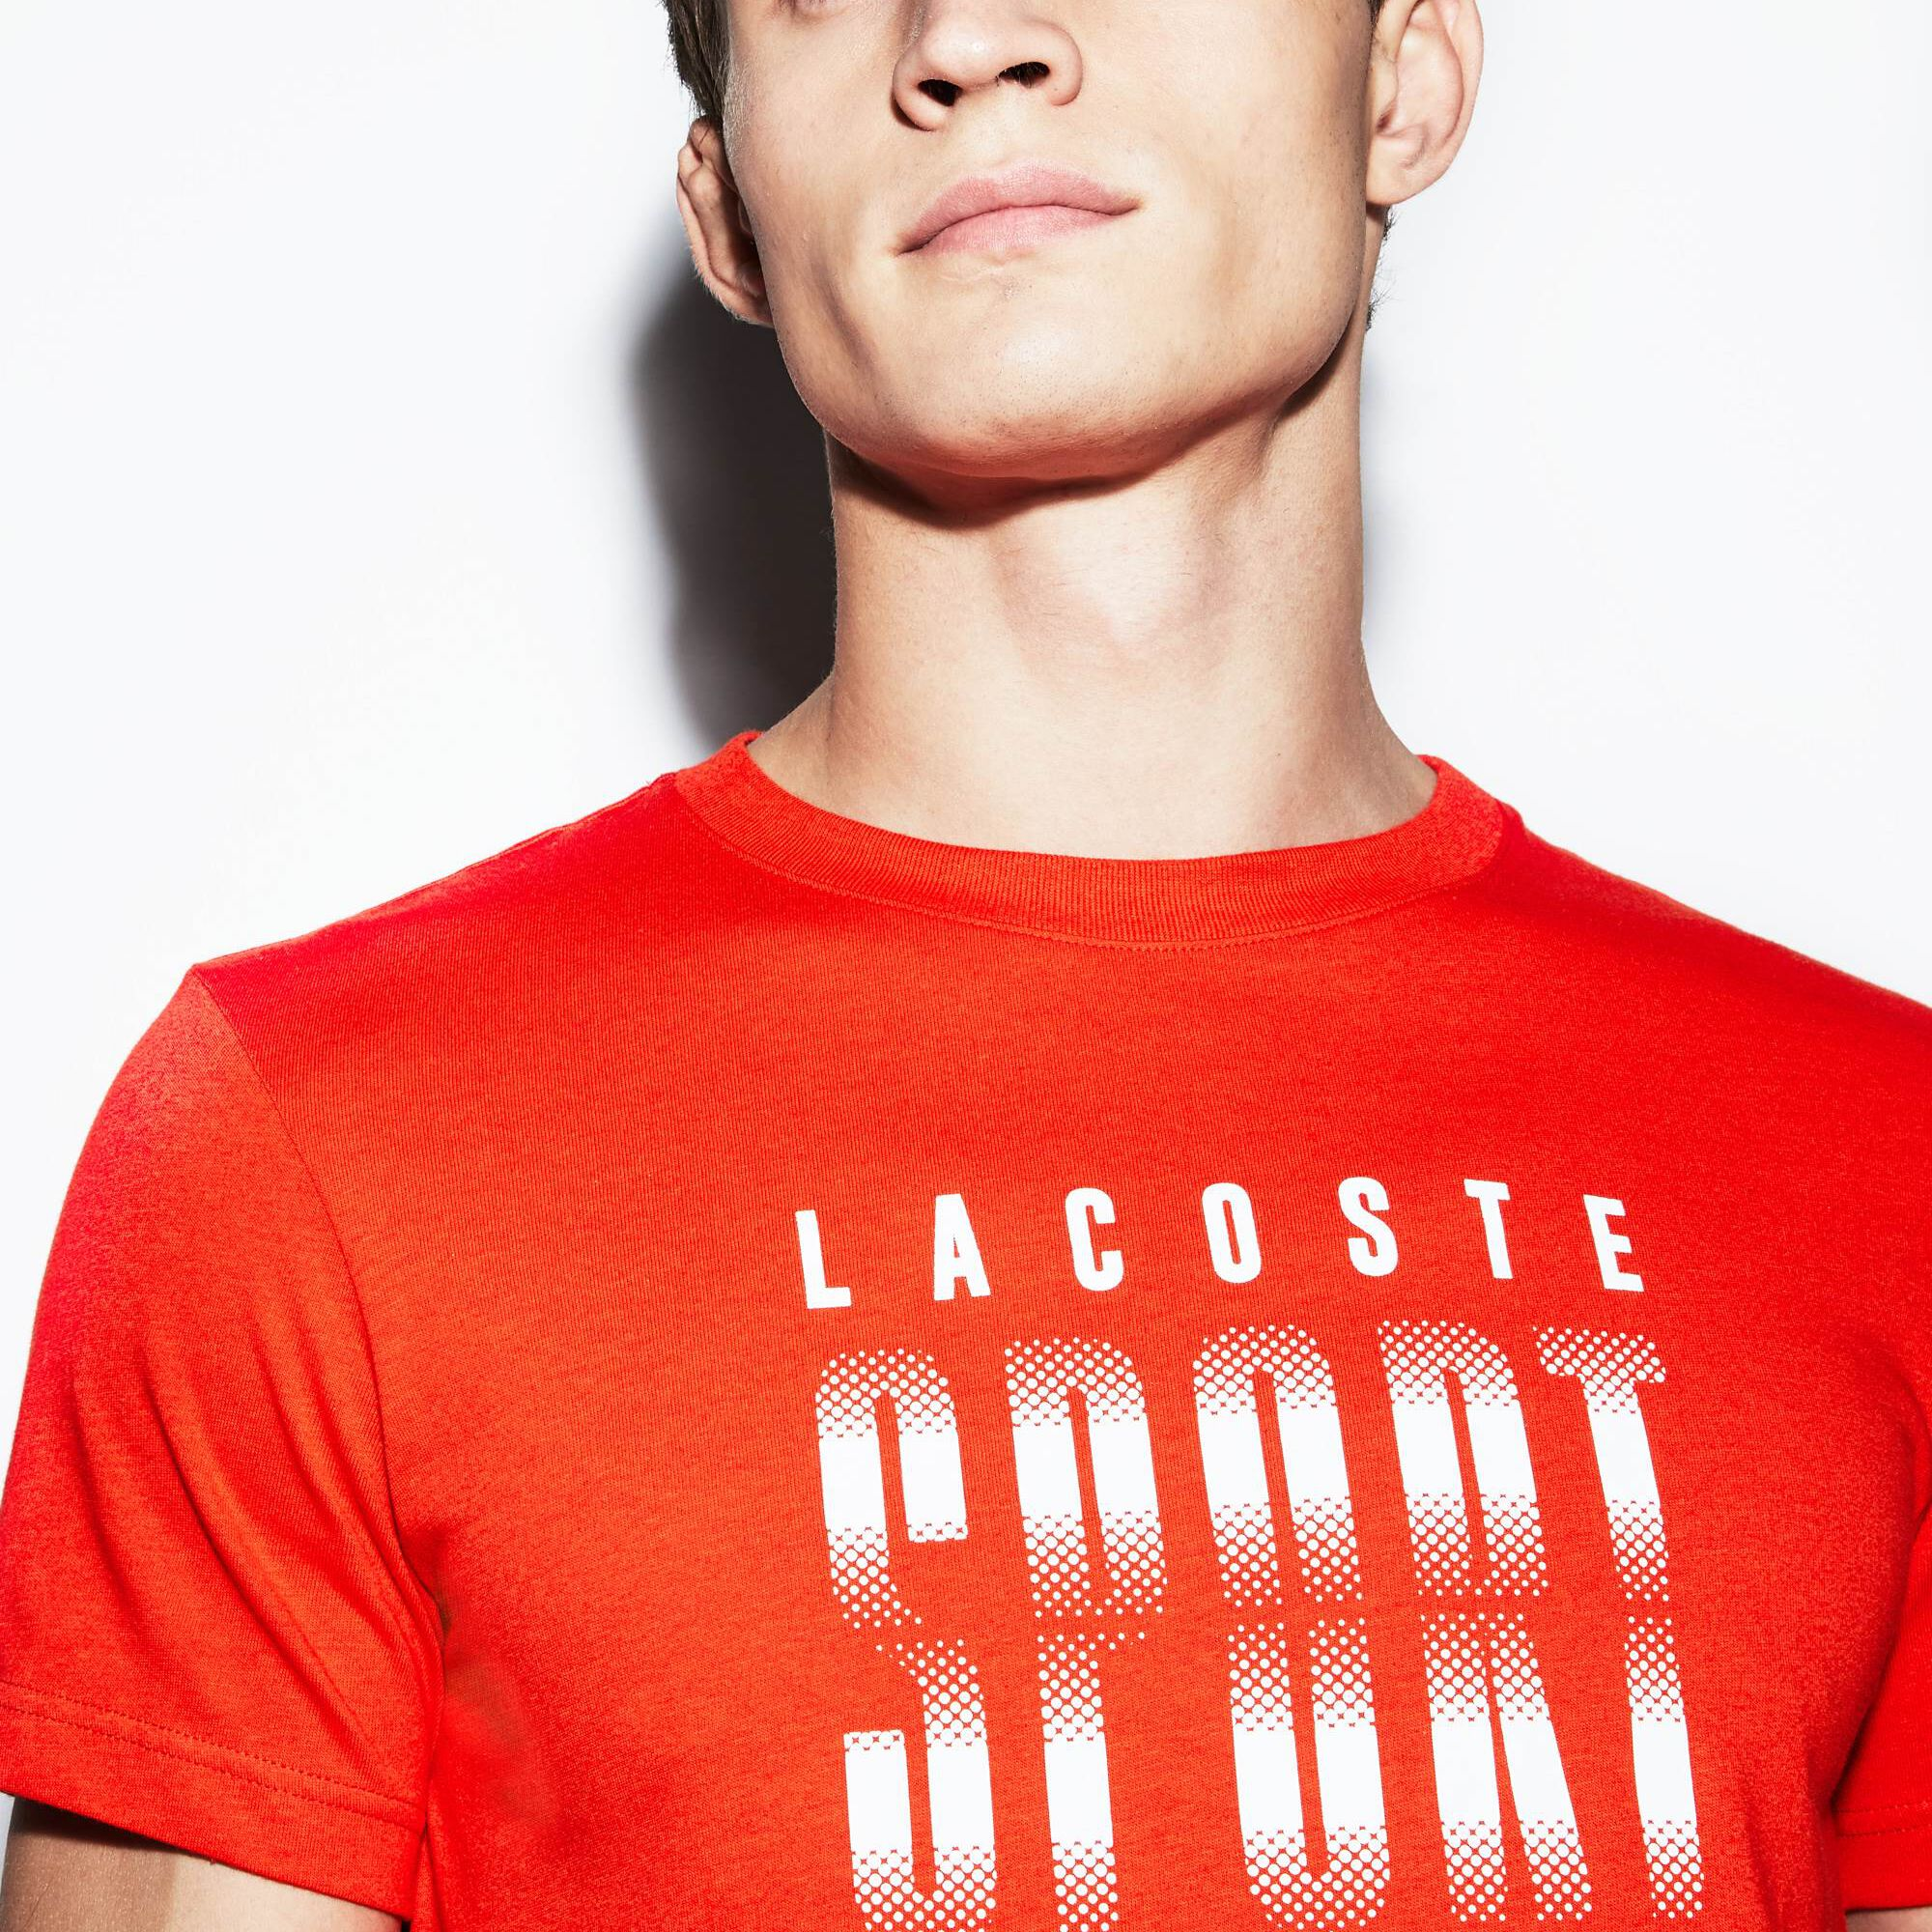 Men's Lacoste SPORT Crew Neck Lettered Tech Jersey Tennis T-shirt